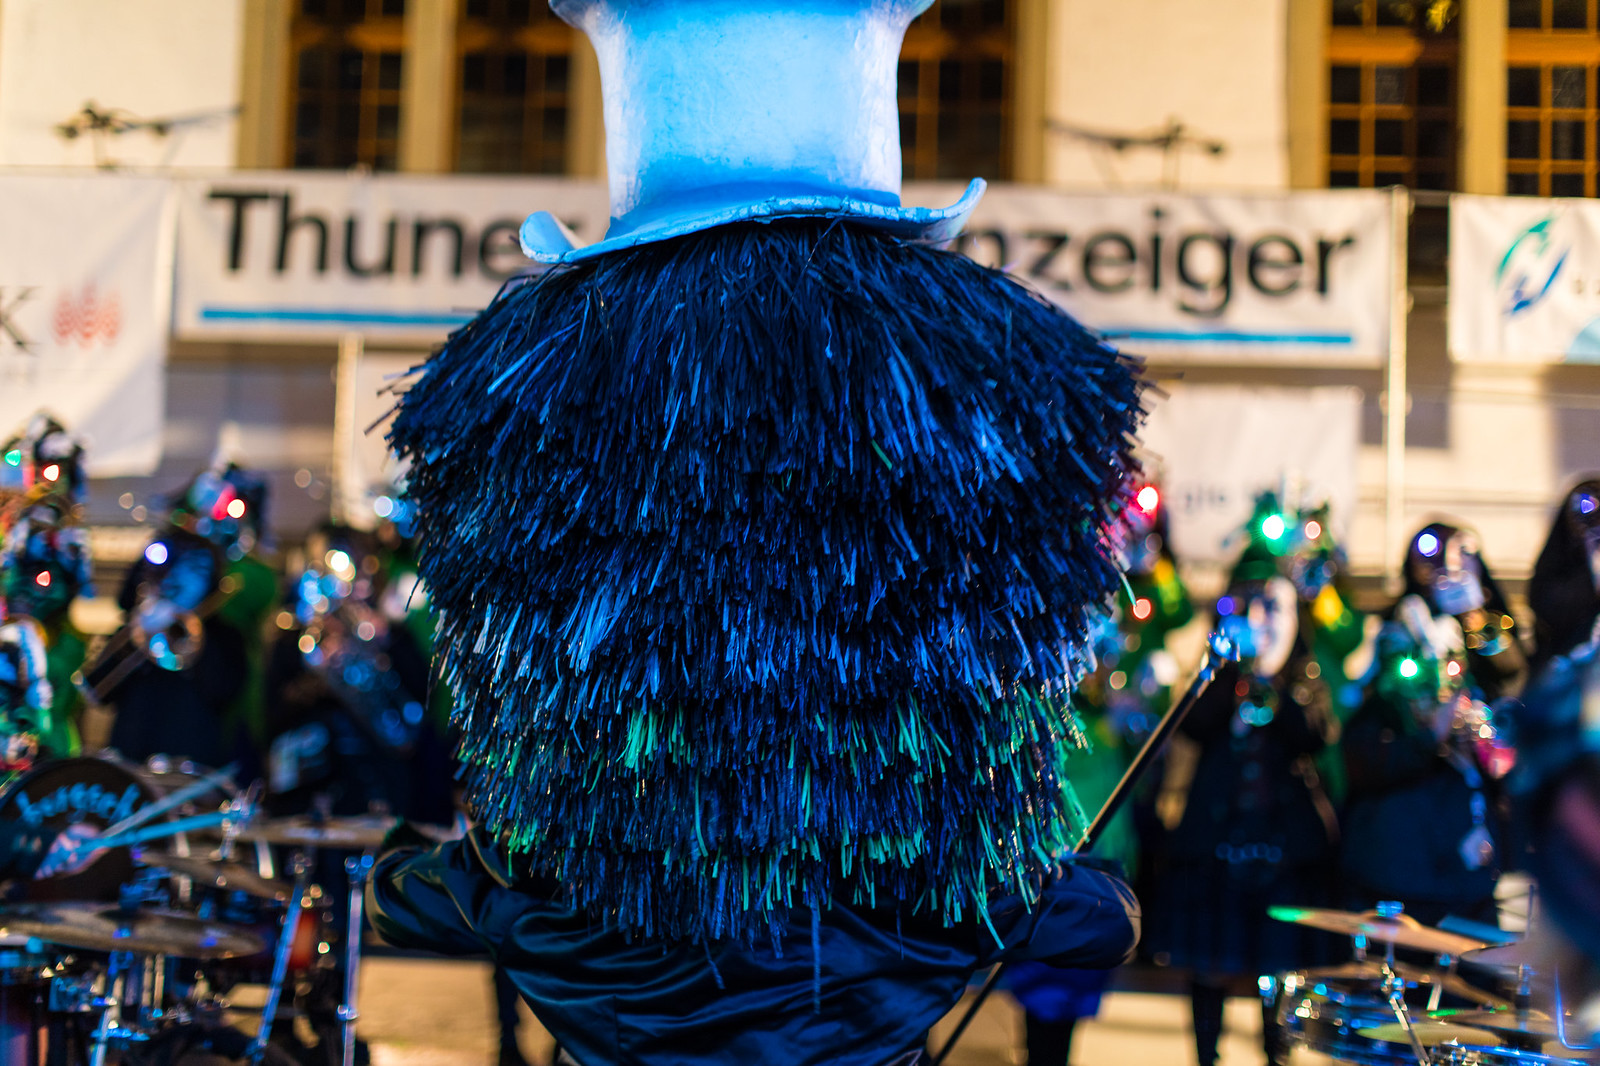 Thuner Fasnacht 2020 (26)